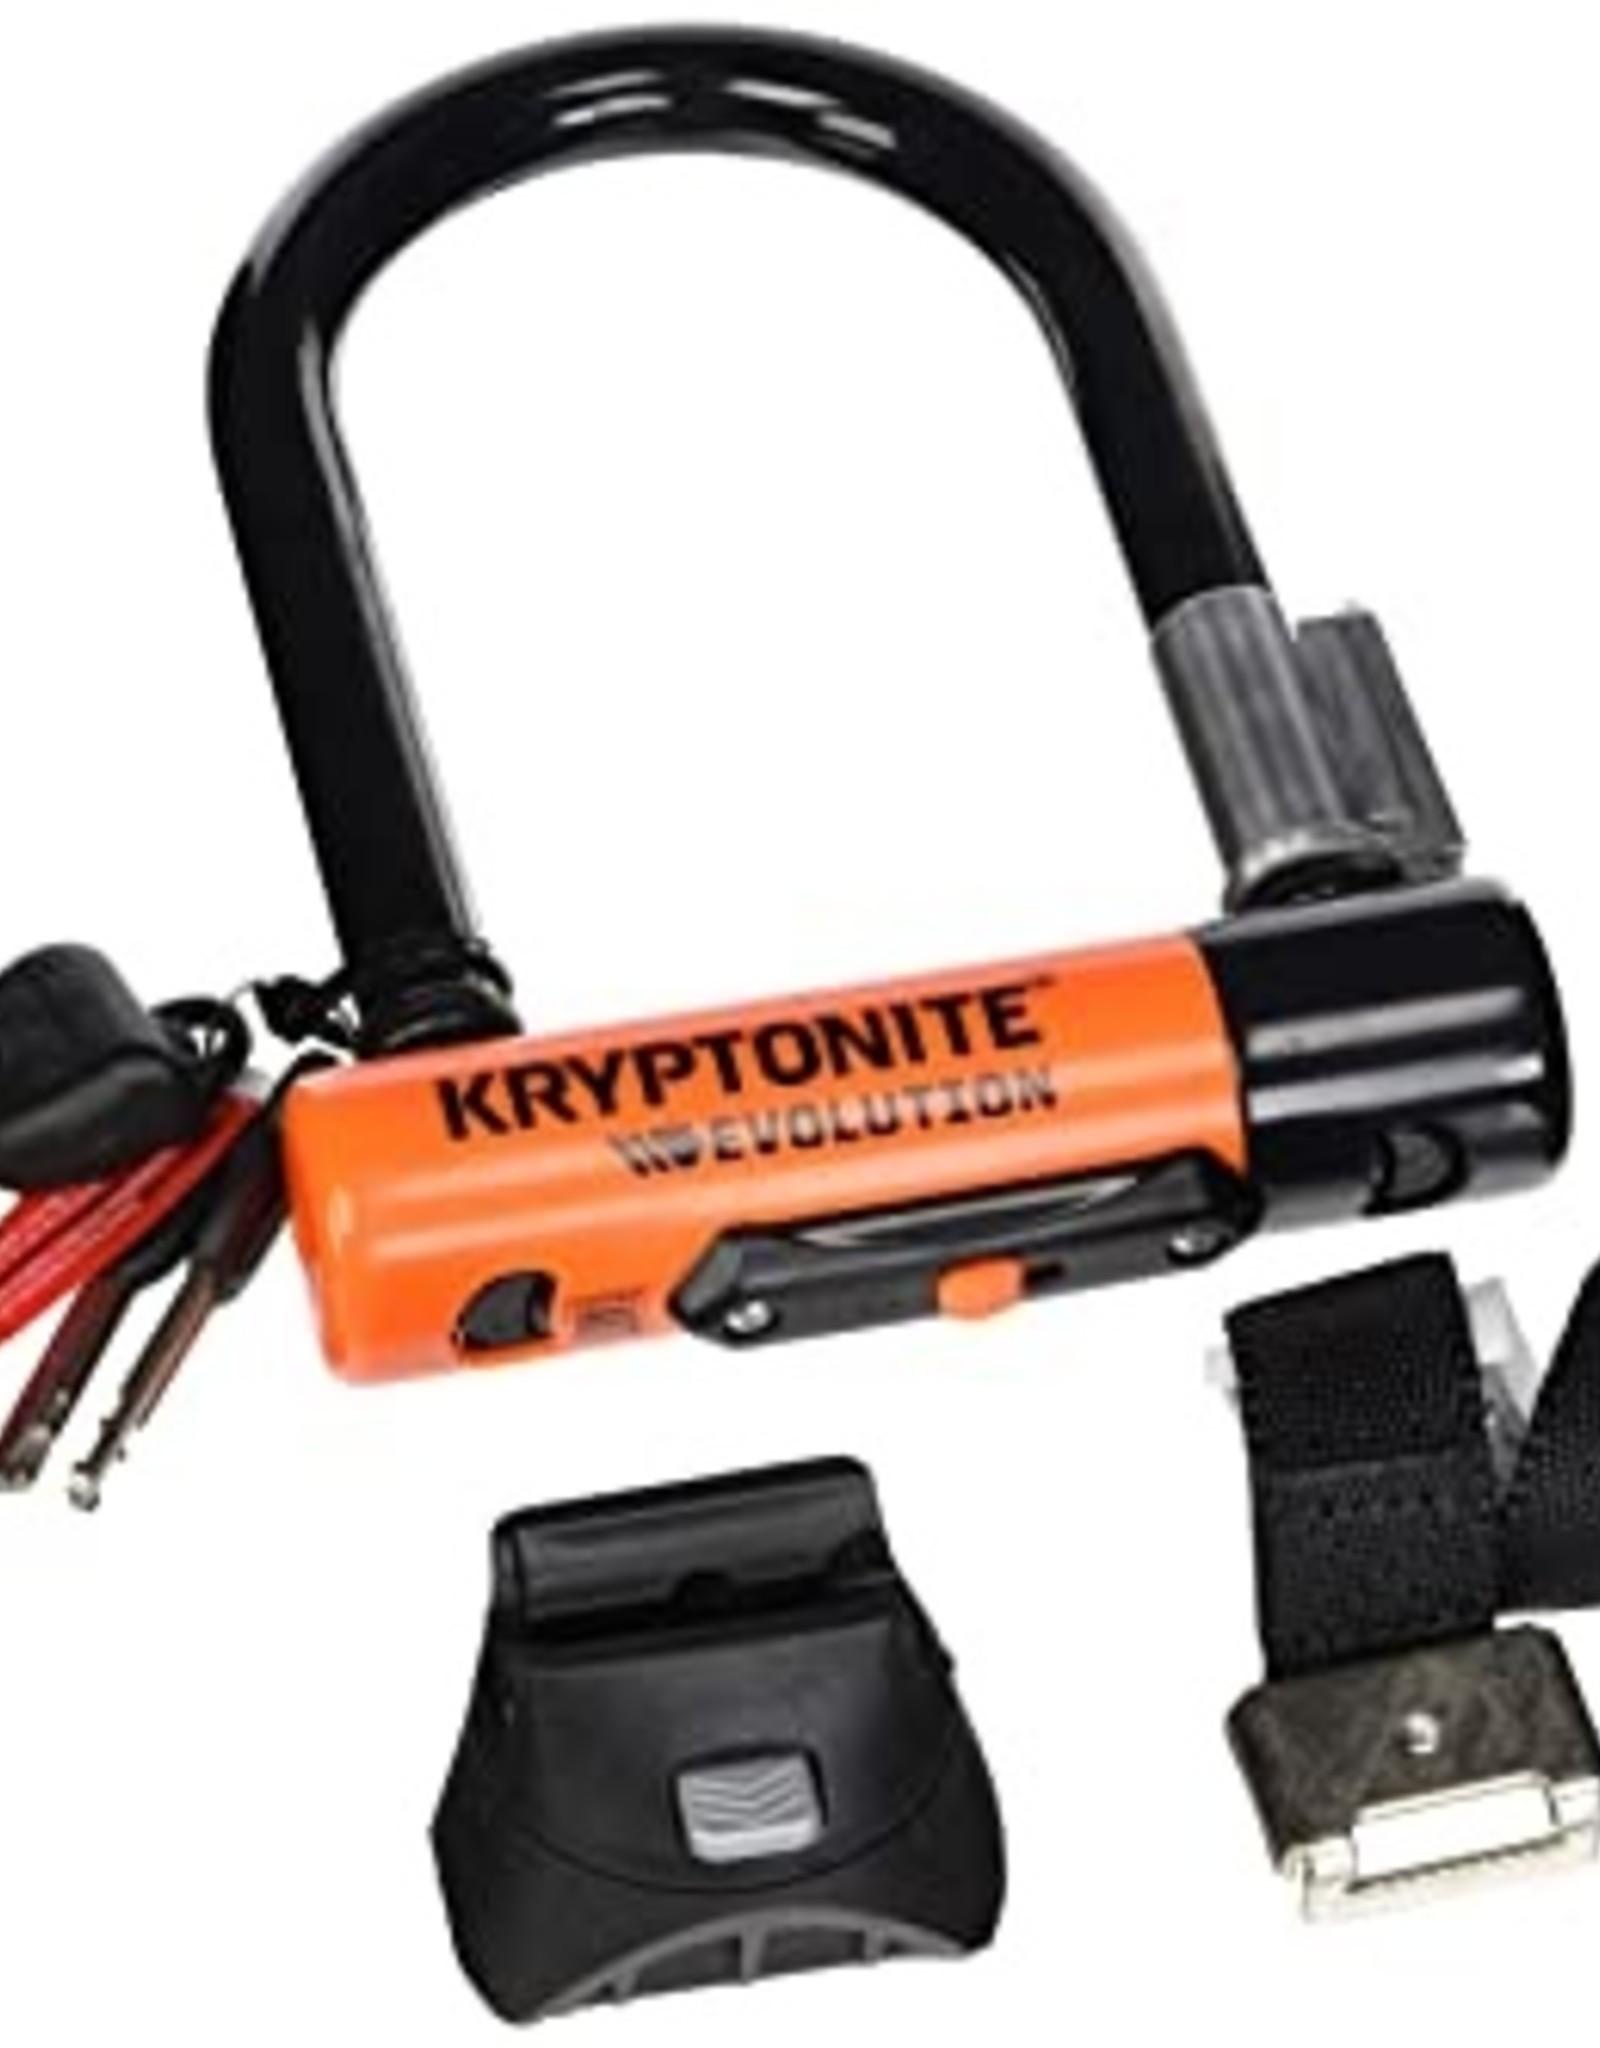 Kryptonite U EVOLUTION MINI-5 12 3.25x5.5